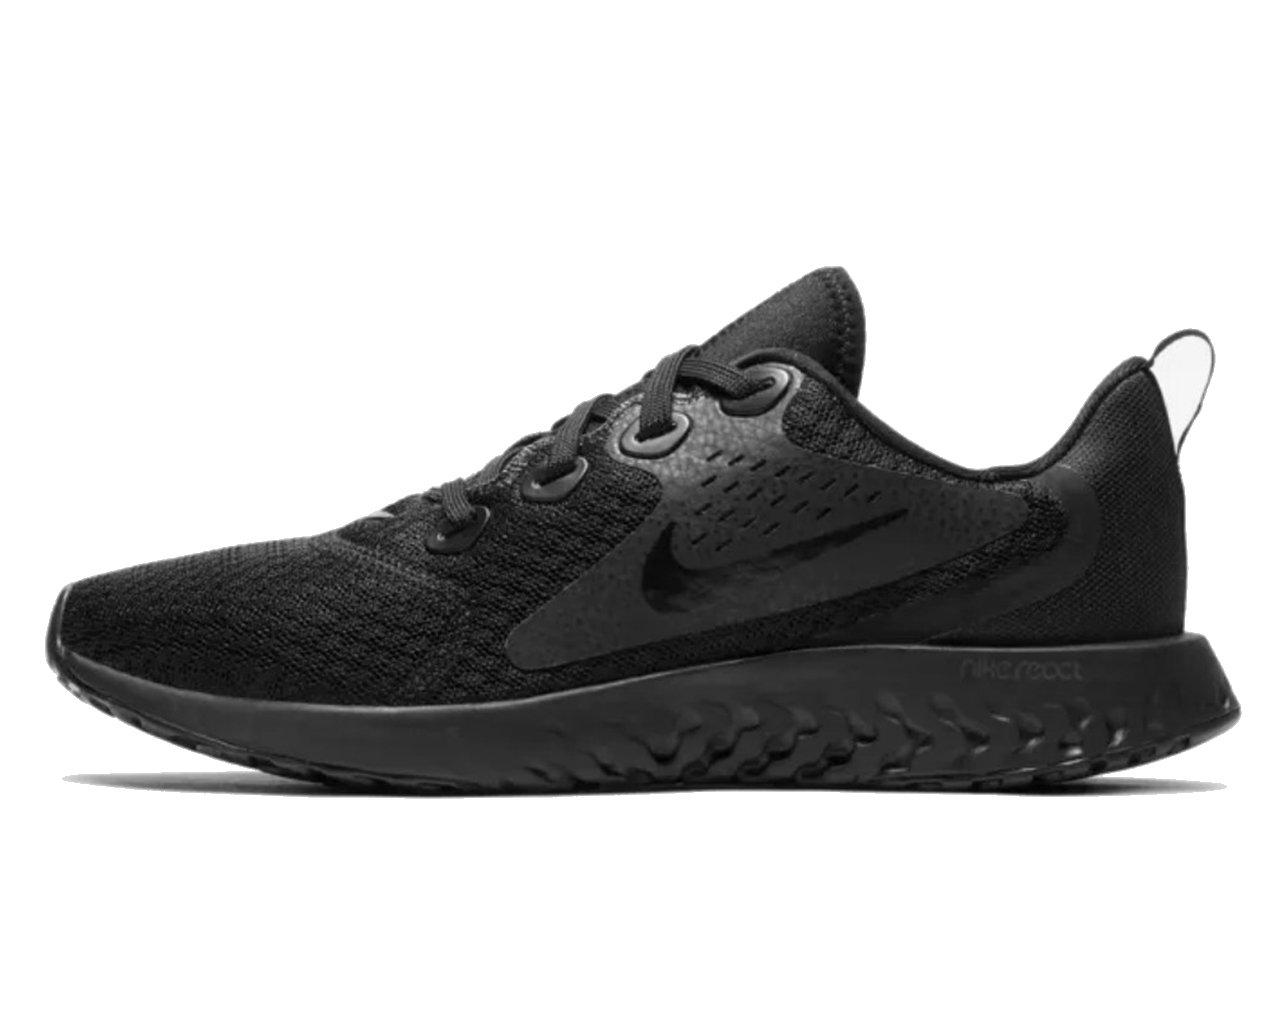 337d7d70bffd53 Nike - Legend React Gs Trainers Black for Men - Lyst. View fullscreen